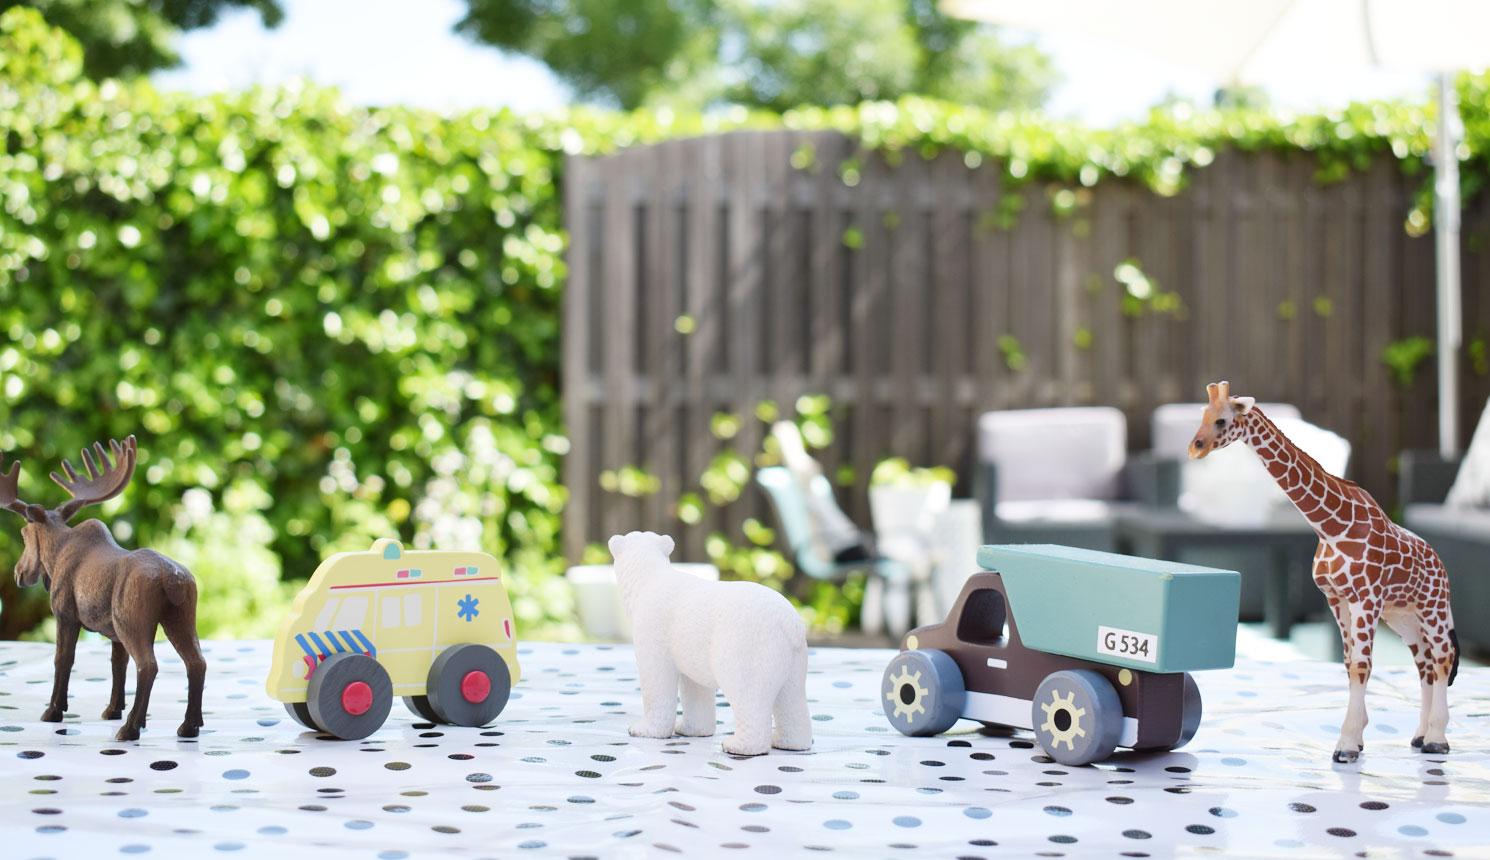 mamalifestyle tuin buiten spelen speelgoed